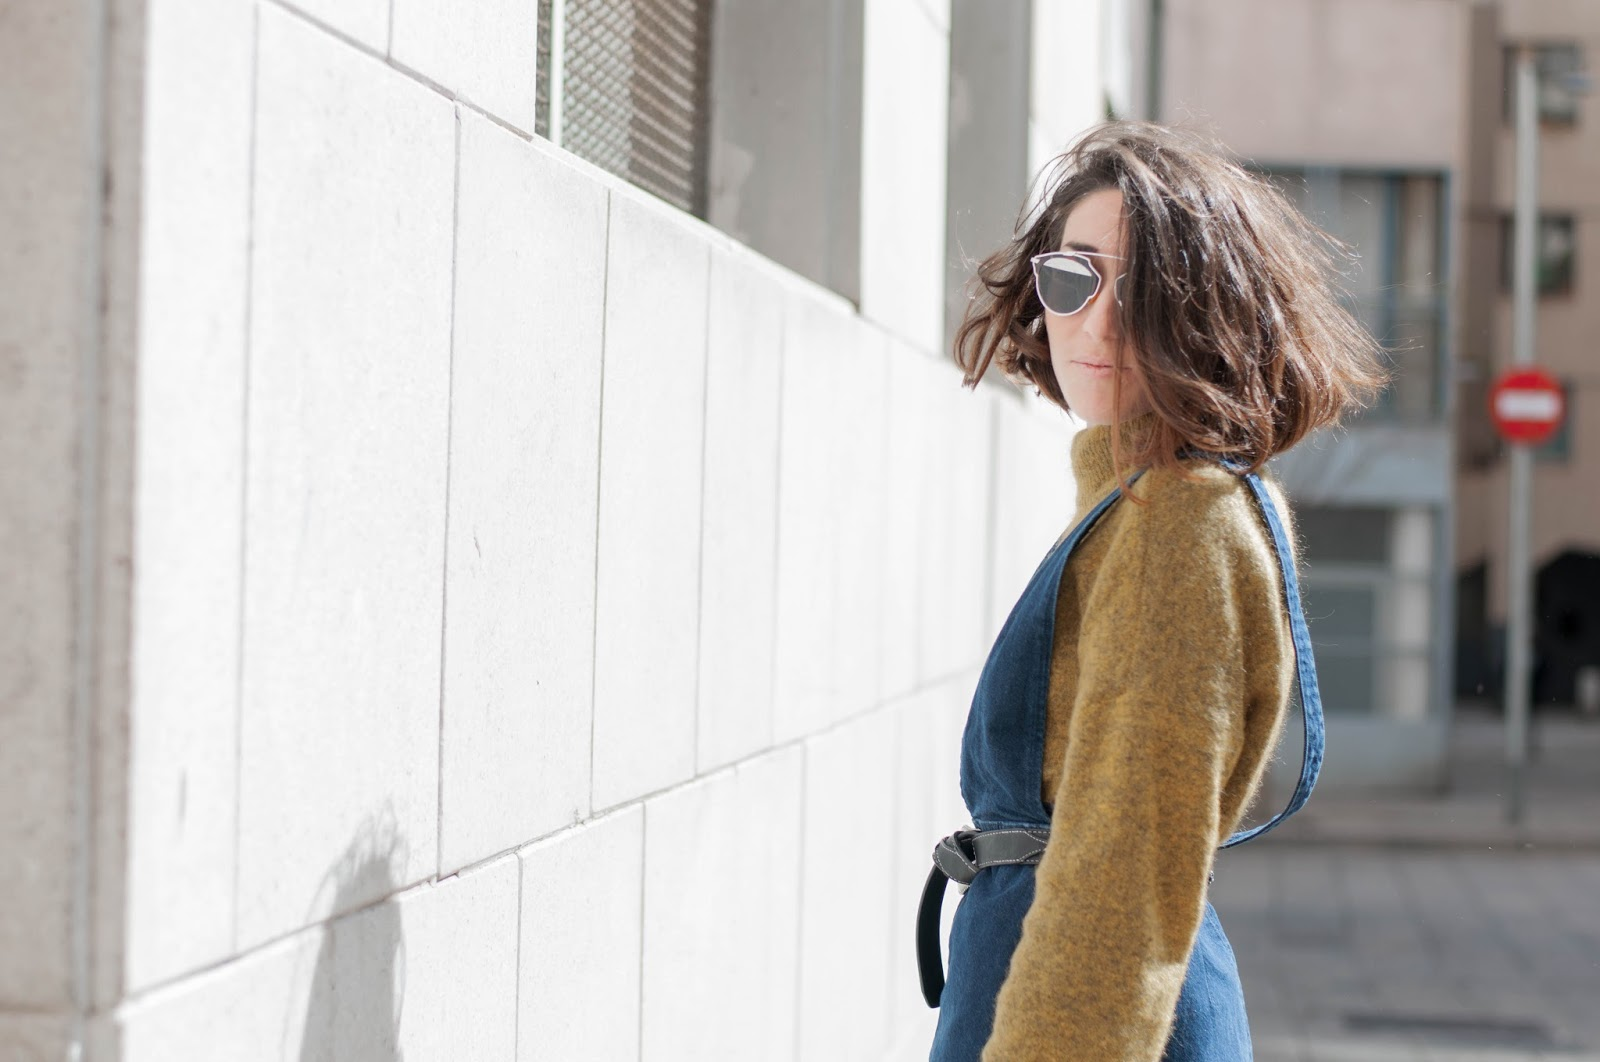 Mono y Jersey H&M, botines Zara